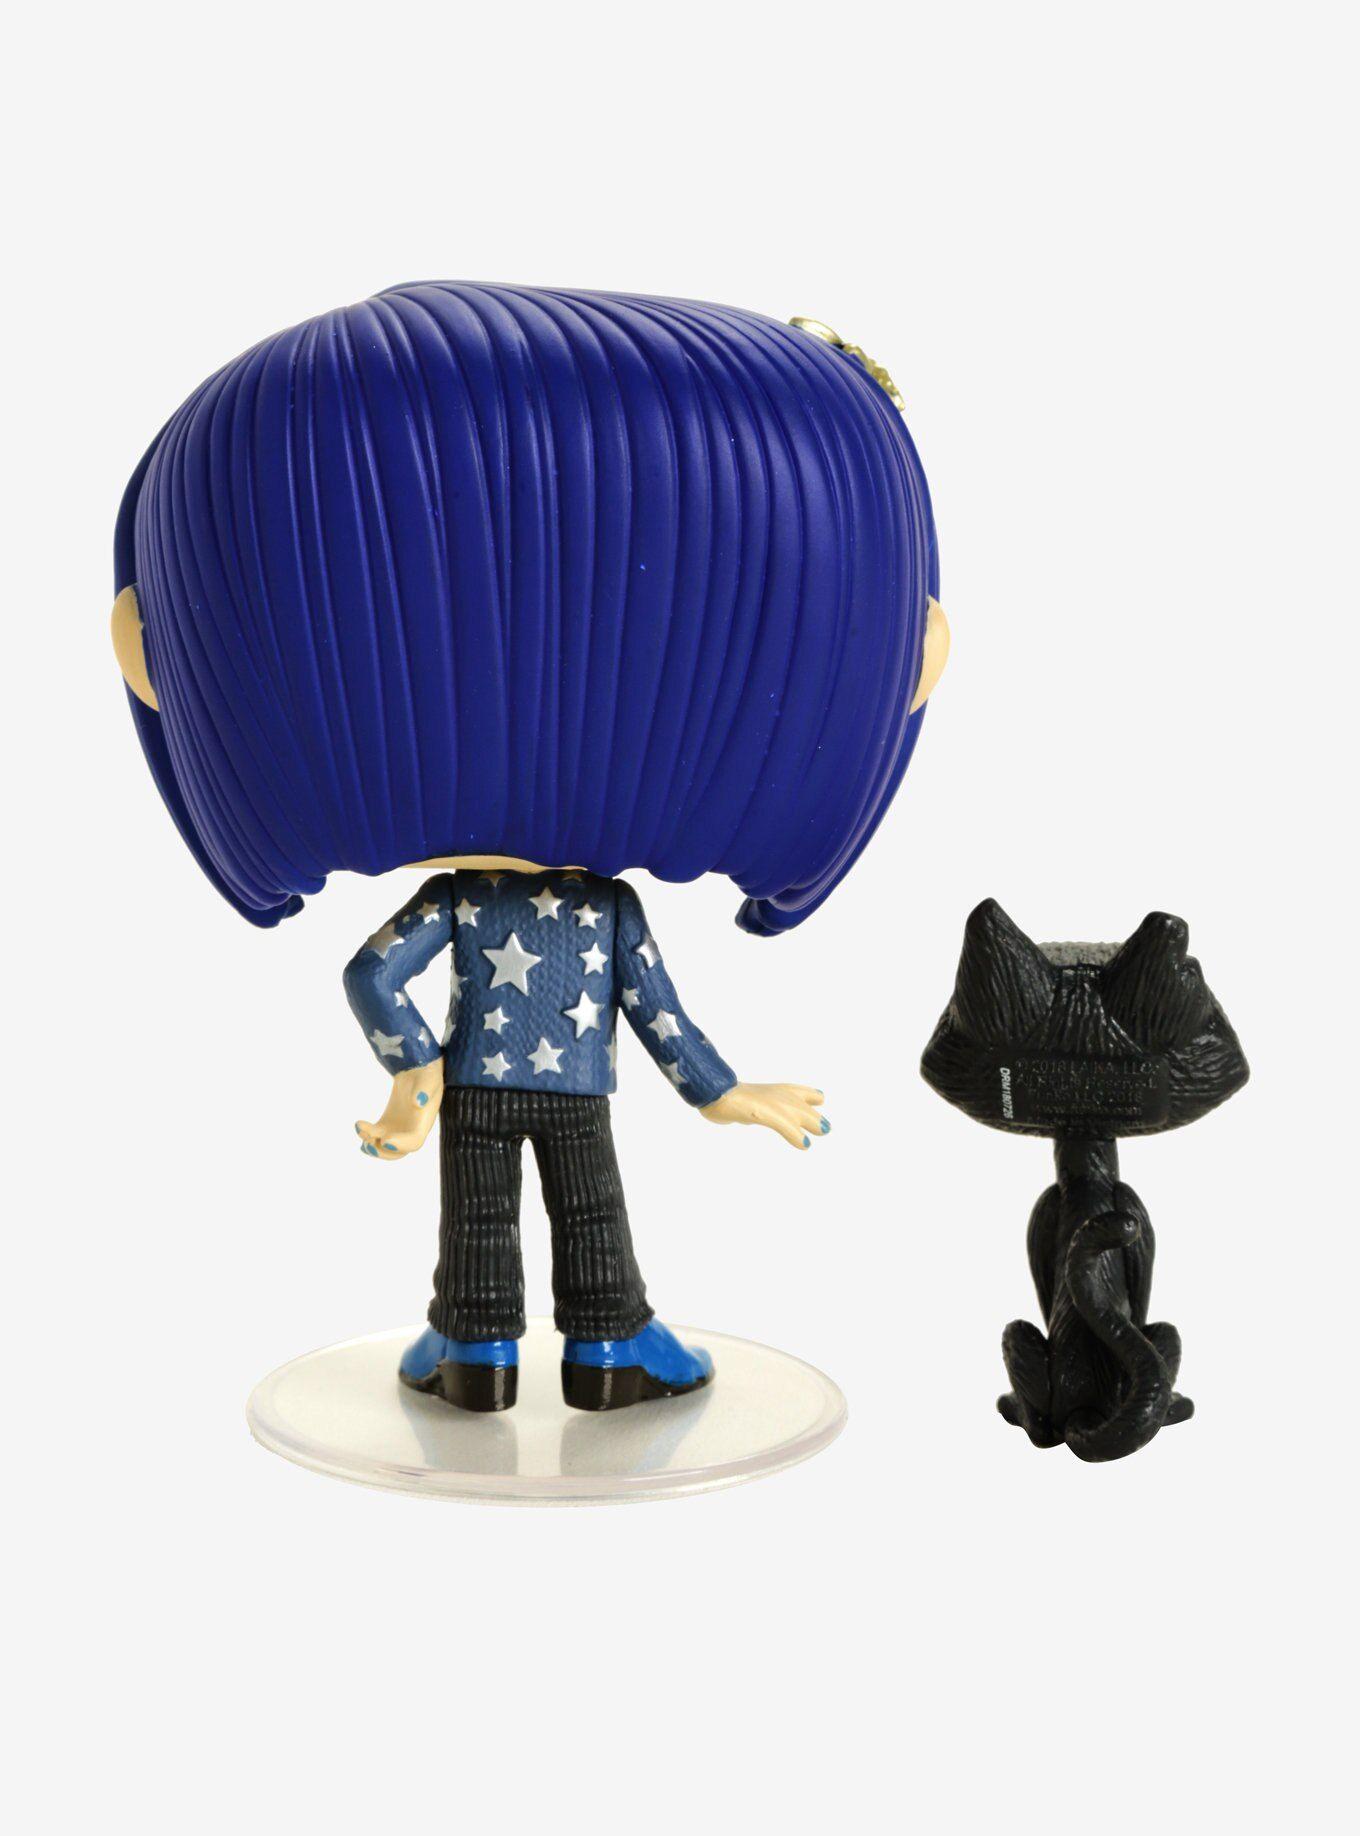 Coraline with Cat #422 - Funko Pop! Animation